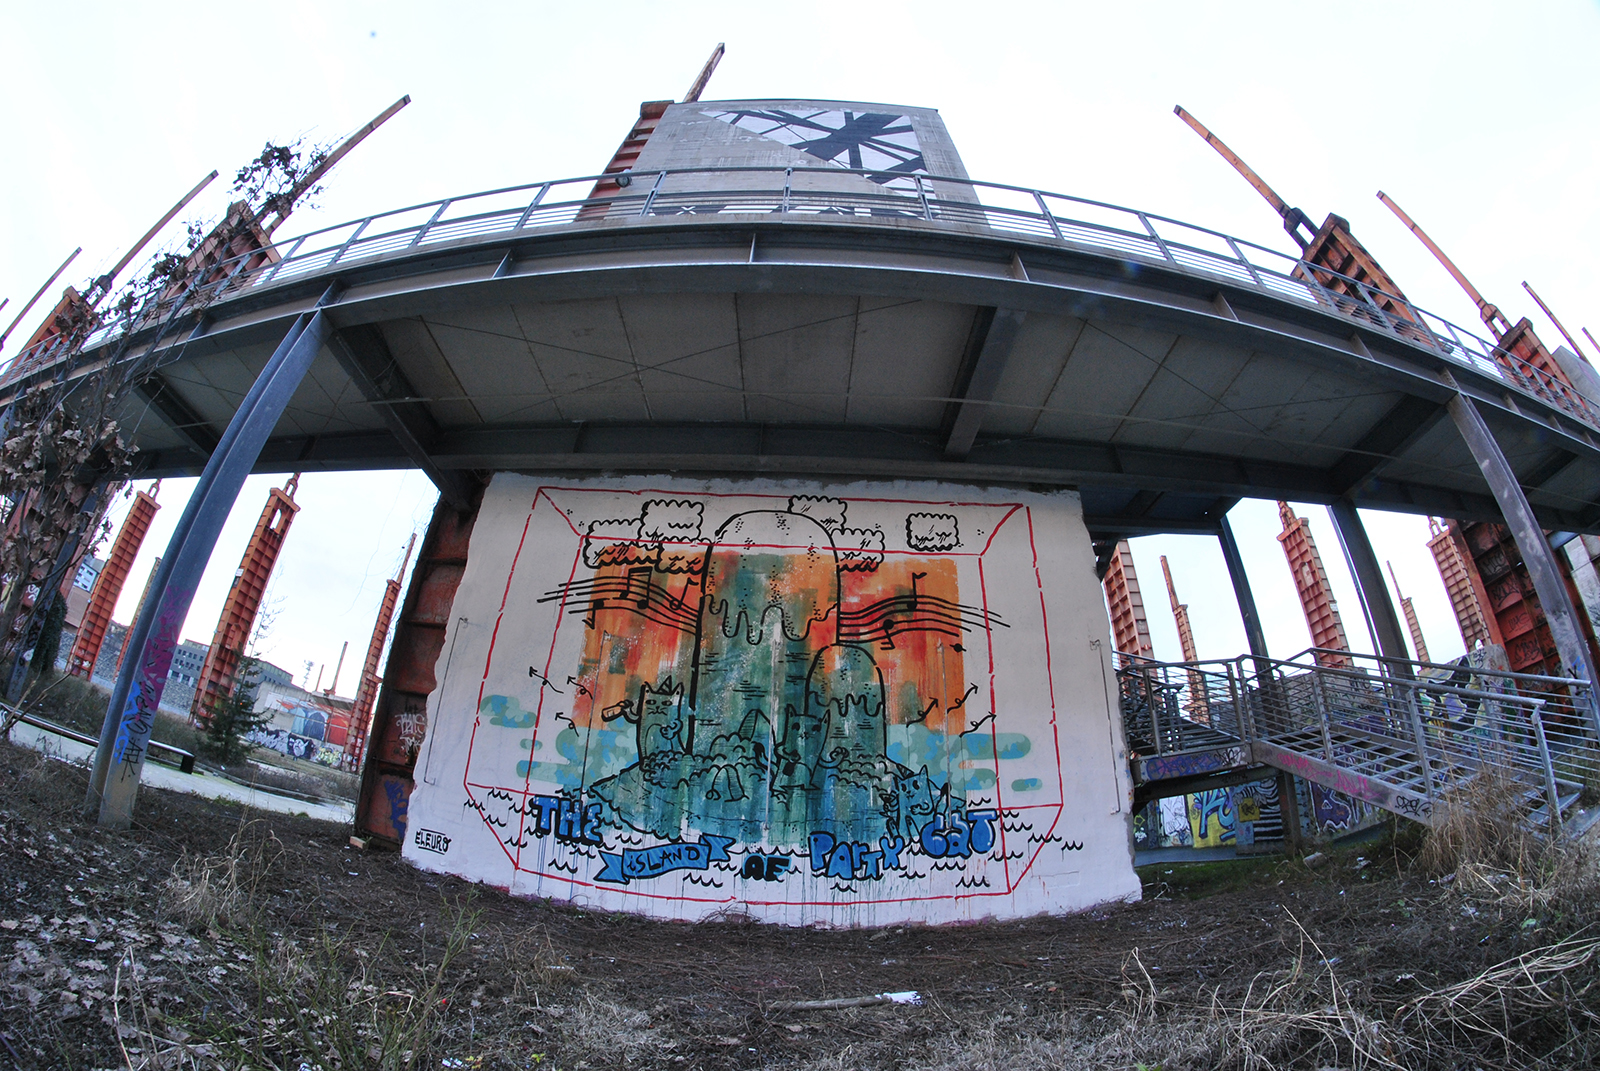 el-euro-new-mural-at-parco-dora-torino-05